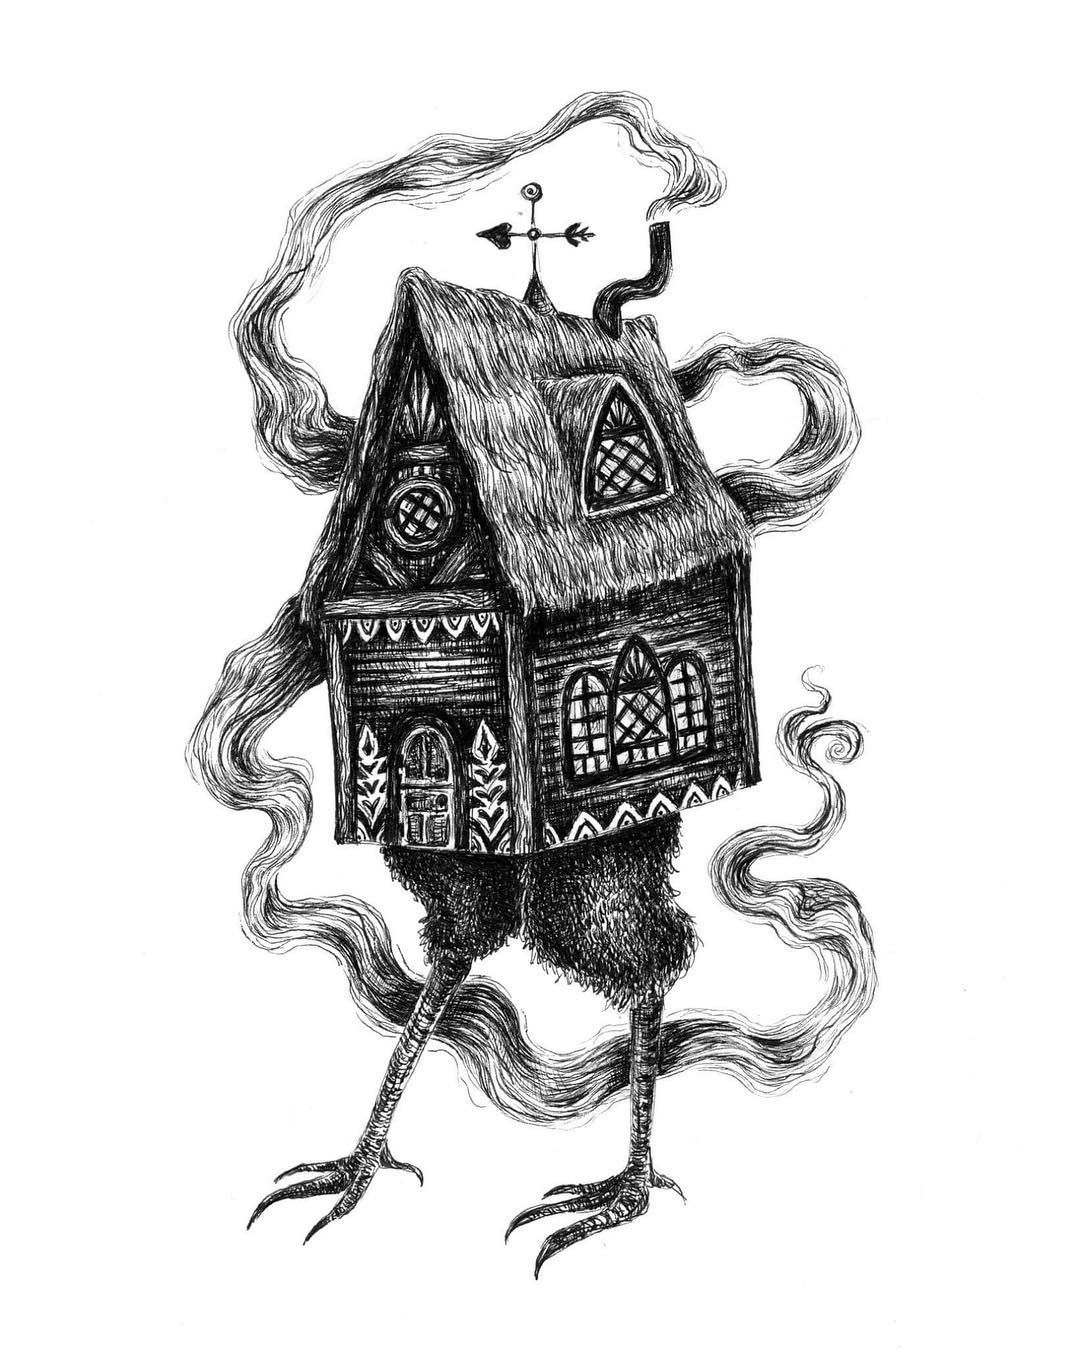 Brett Manning On Instagram Baba Yaga S House Ink Art Illustration Drawing Folklore Witch B Baba Yaga Baba Yaga House Dark Art Illustrations